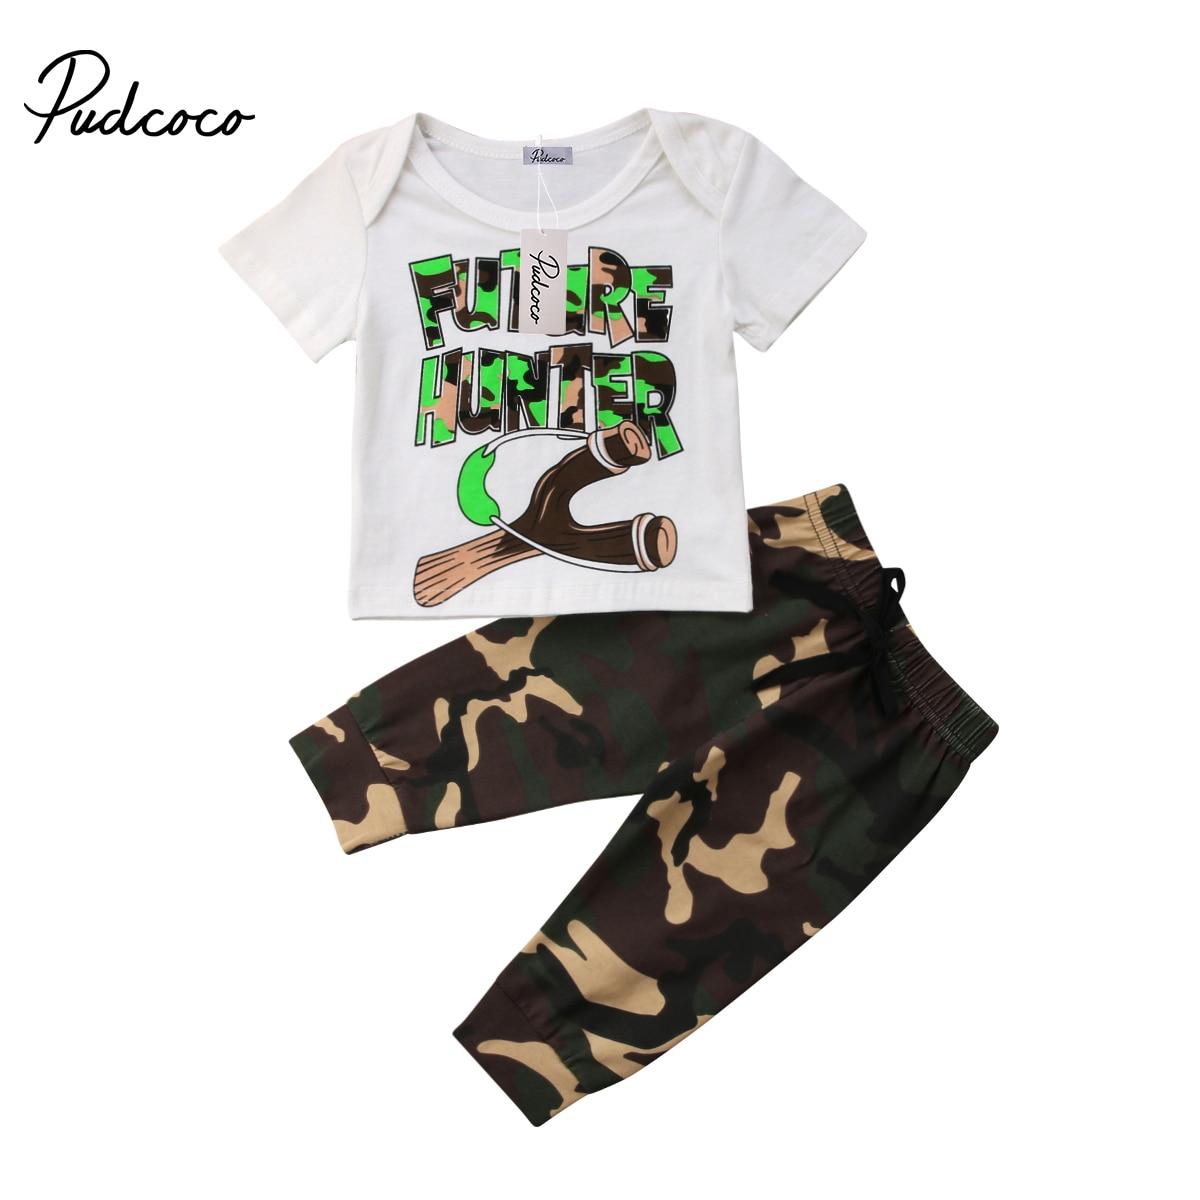 Pudcoco 2Pcs Casual Camo Tracksuit Newborn Baby Boy T-shirt Top+Long Pants Outfits 0-24Months Helen115